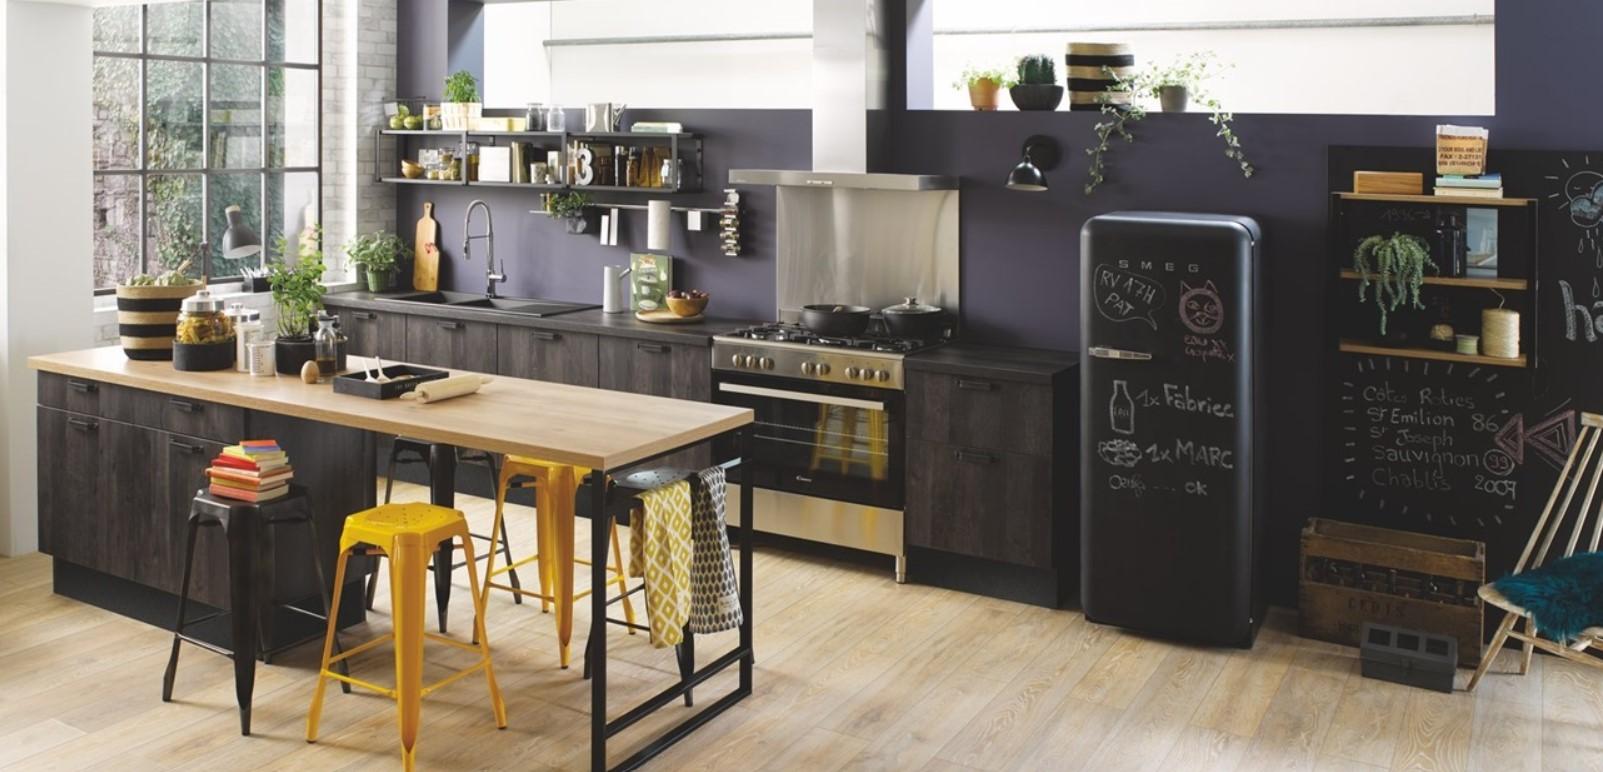 Cuisine De Style Industriel Vega Plus